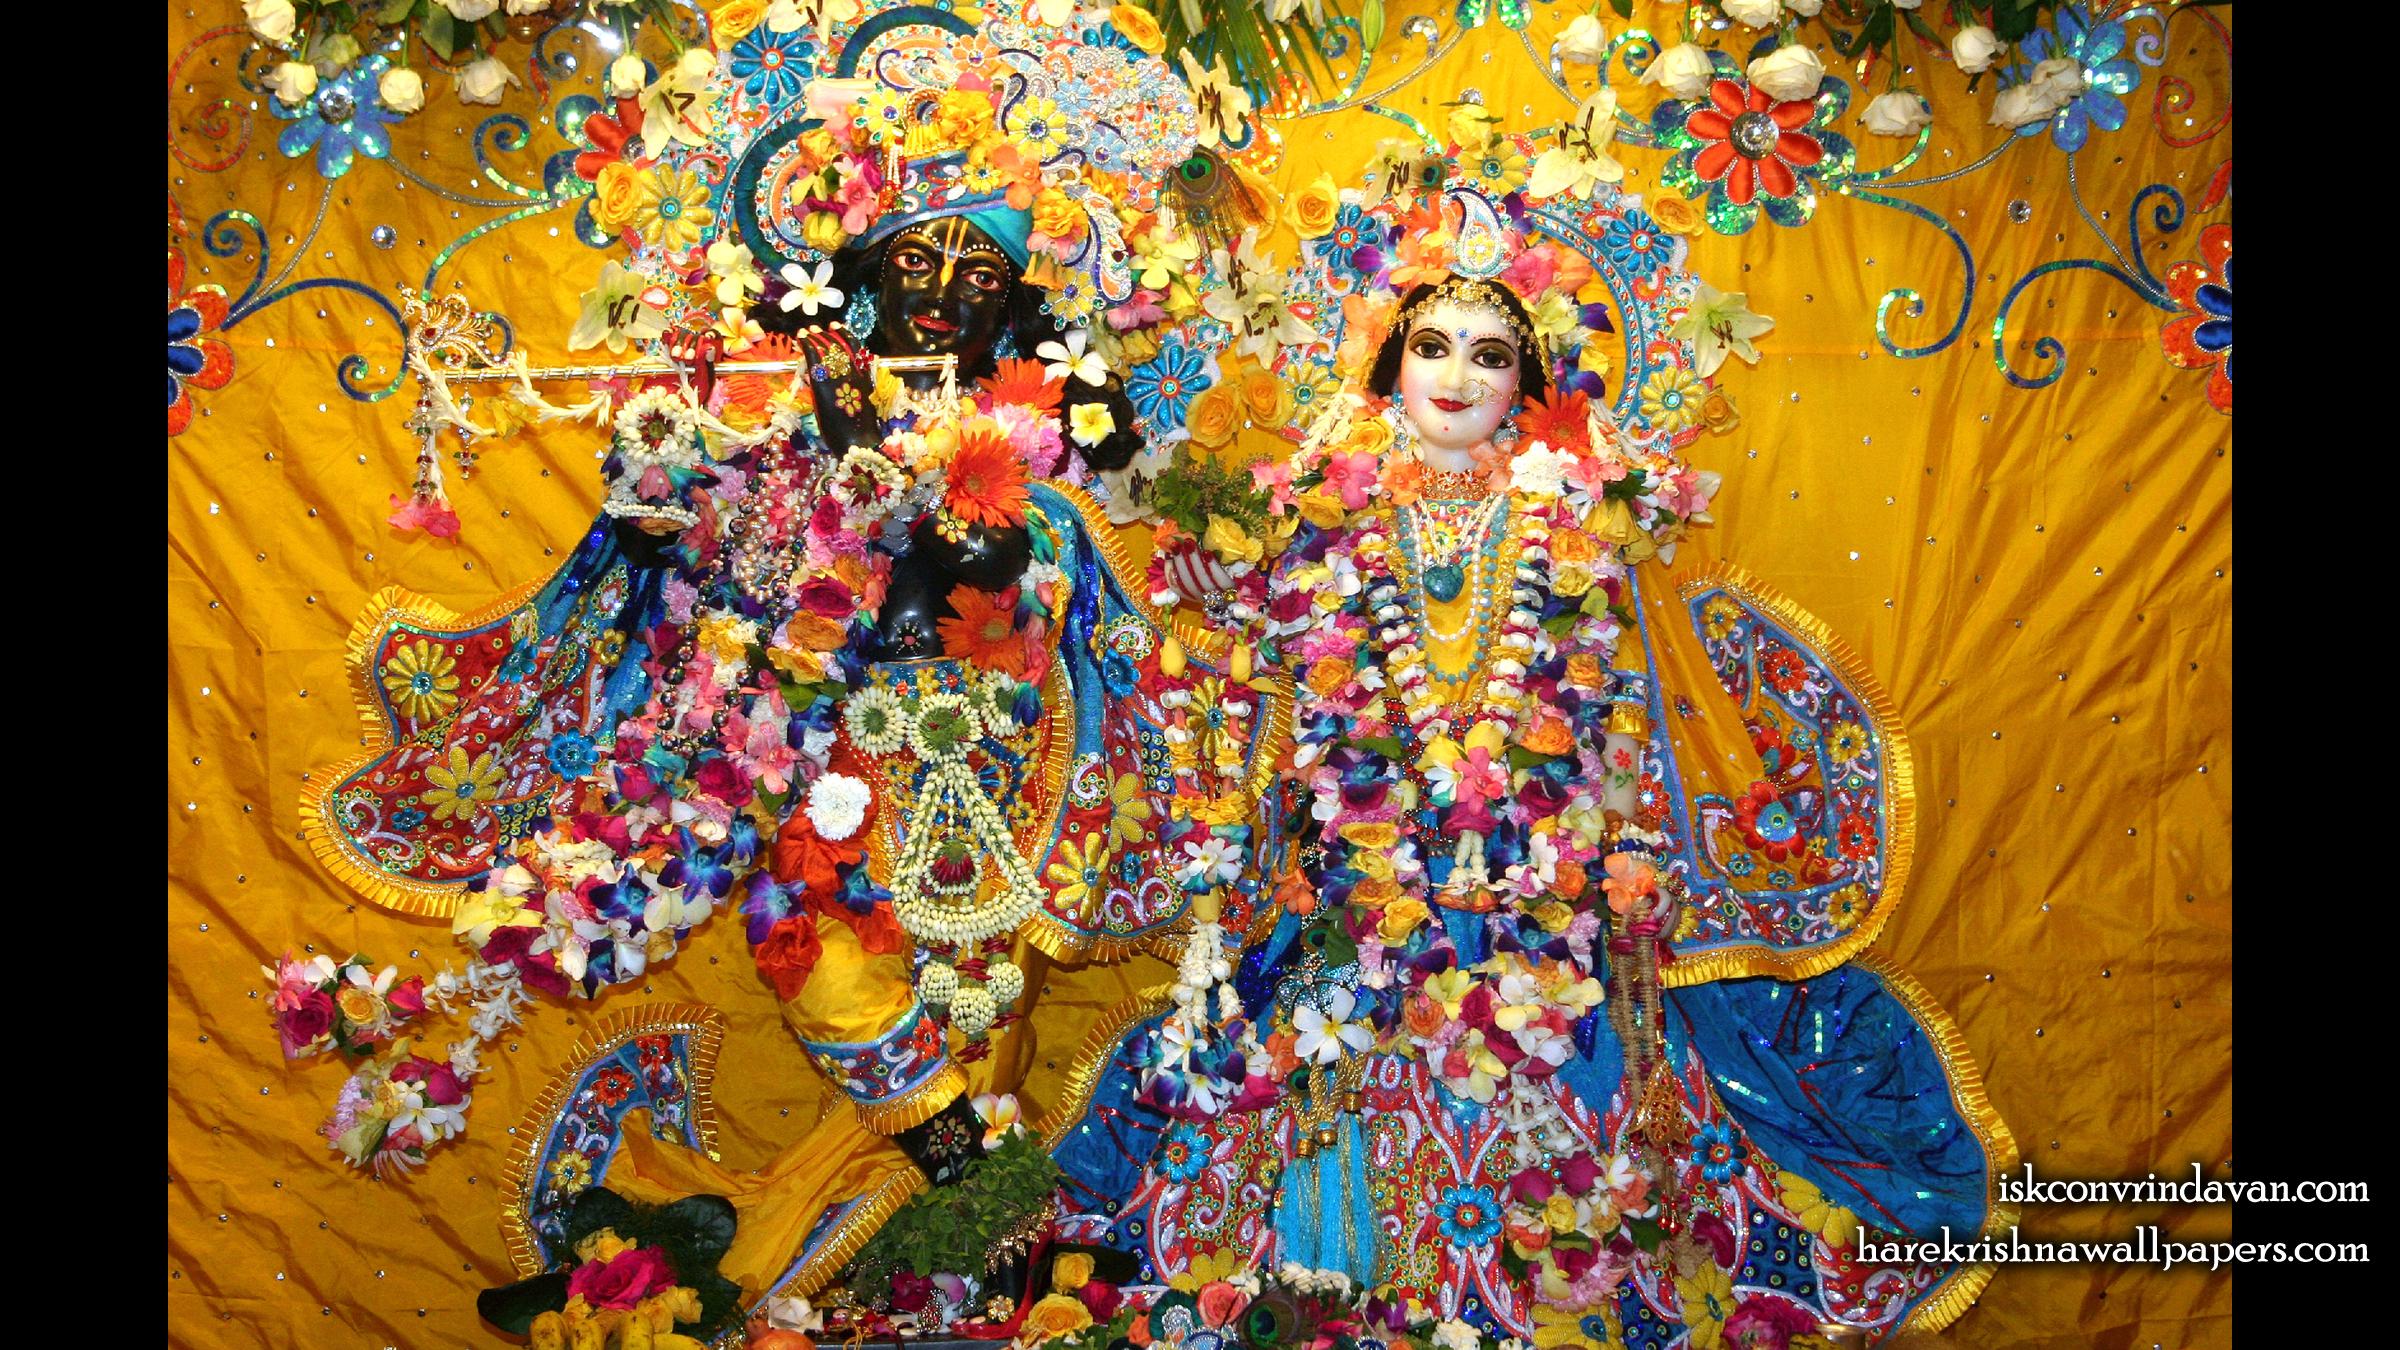 Sri Sri Radha Shyamsundar Wallpaper (013) Size 2400x1350 Download